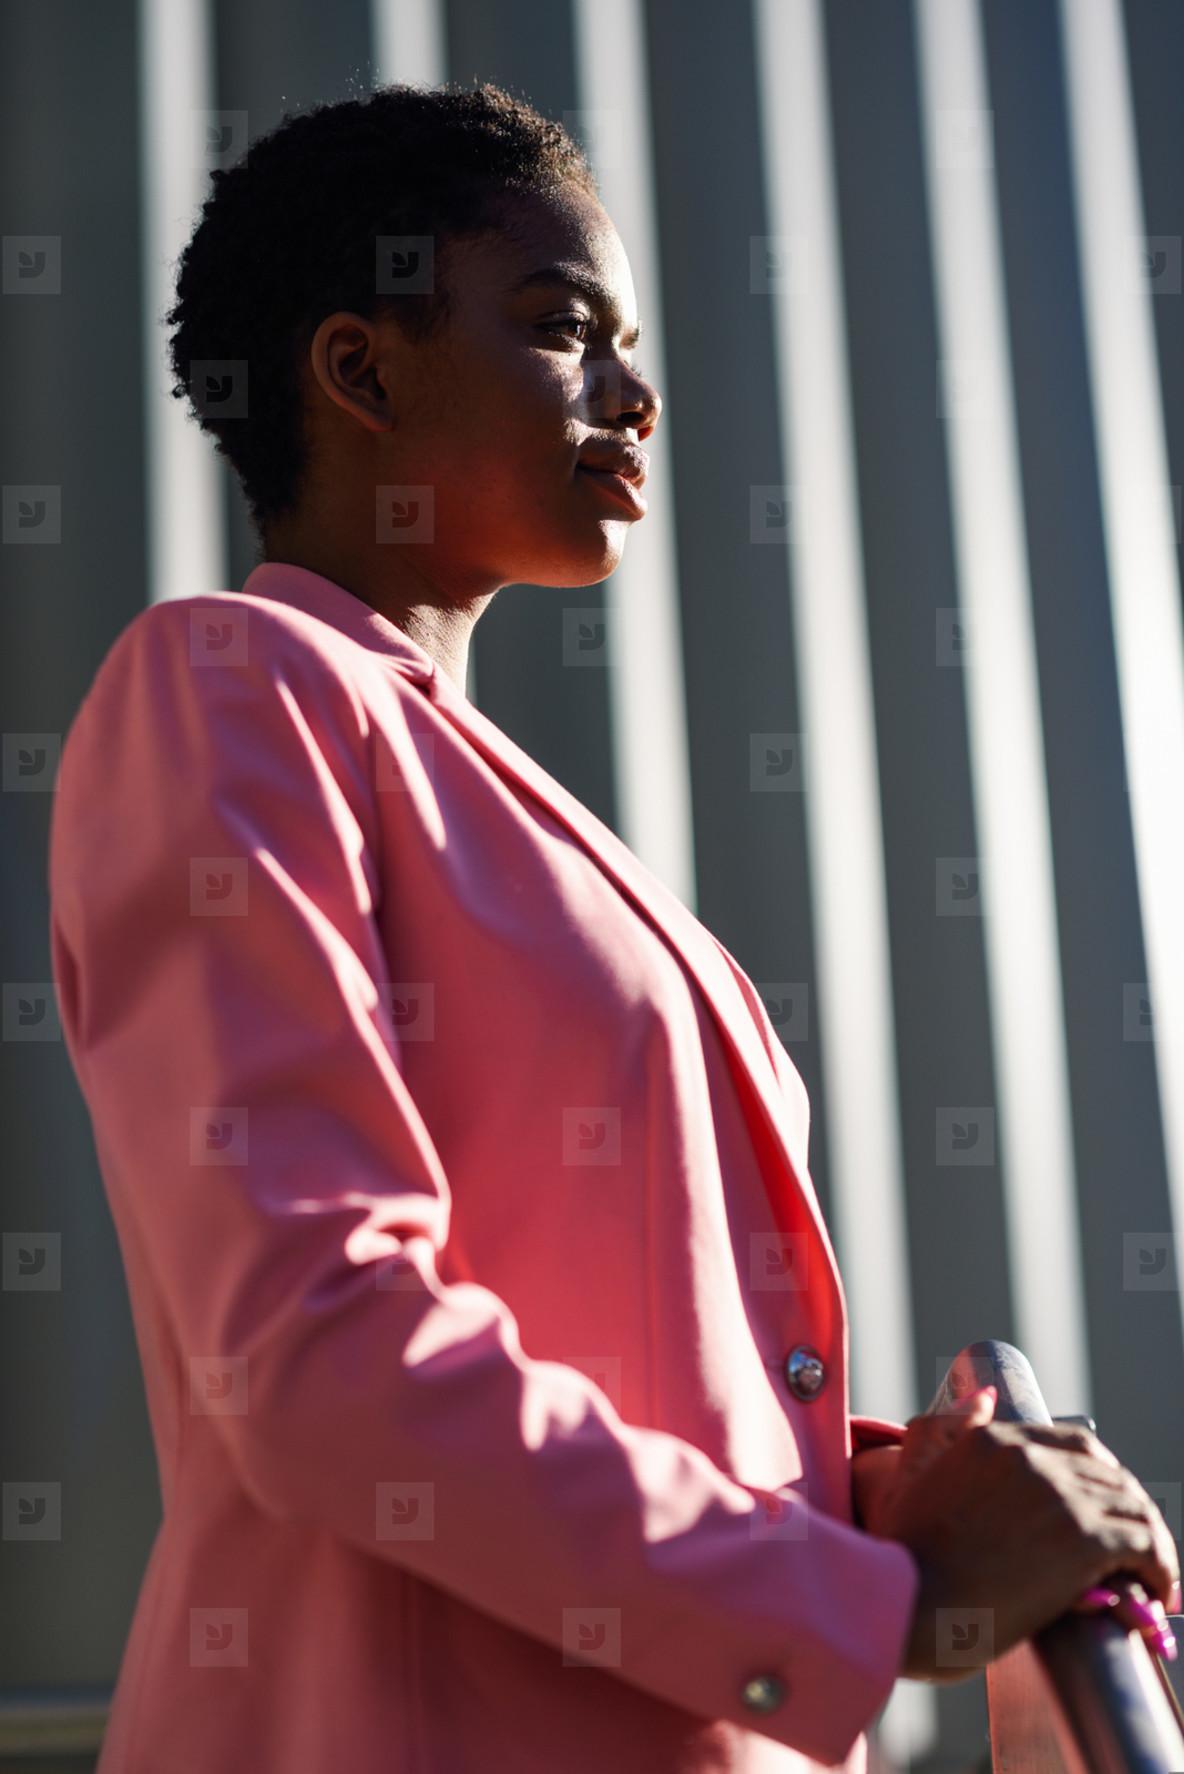 Black businesswoman standing near business office building